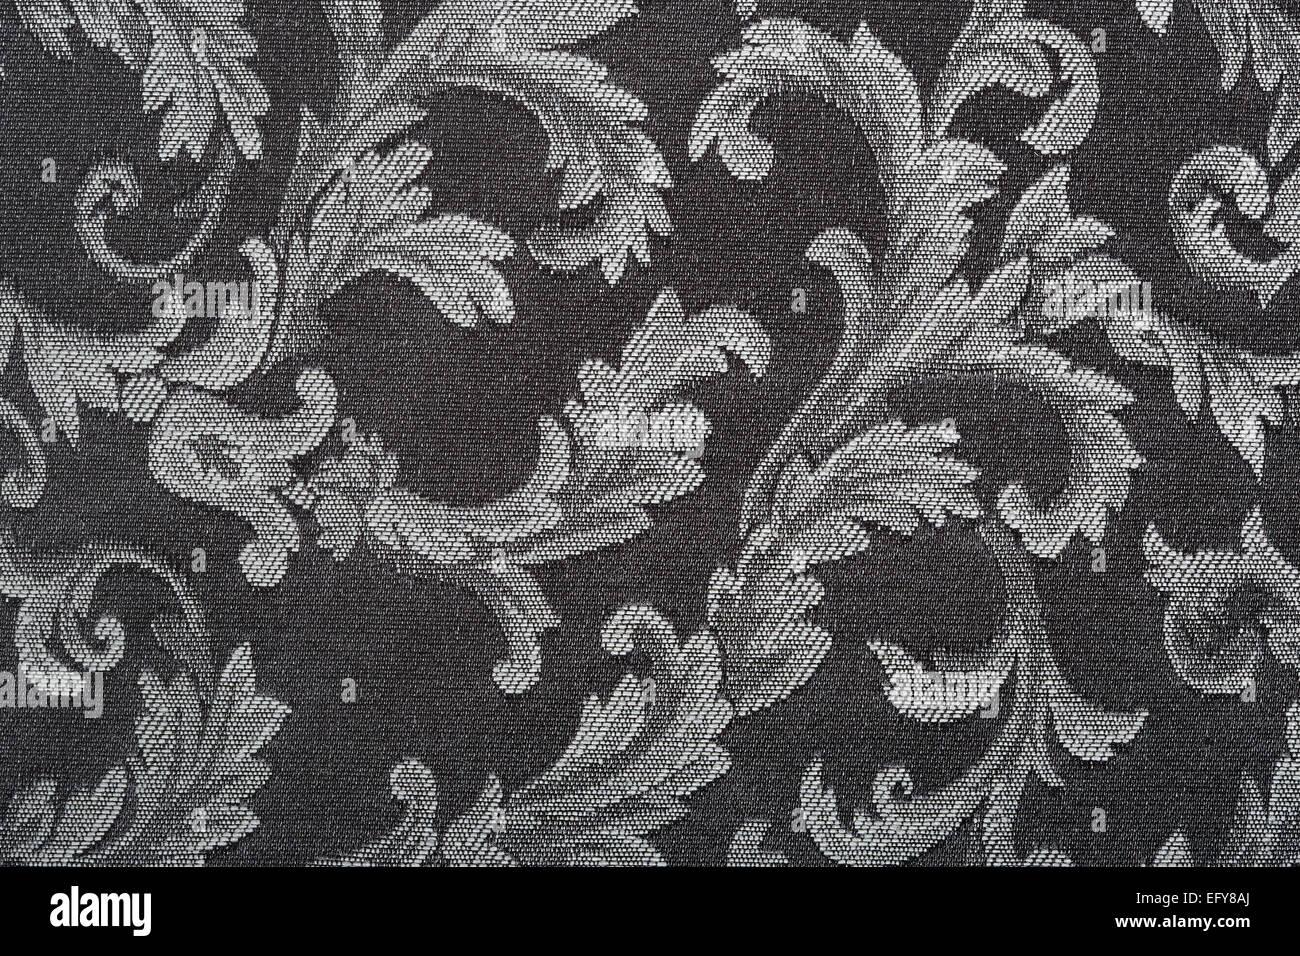 Damask Black Fabric Pattern Texture Background